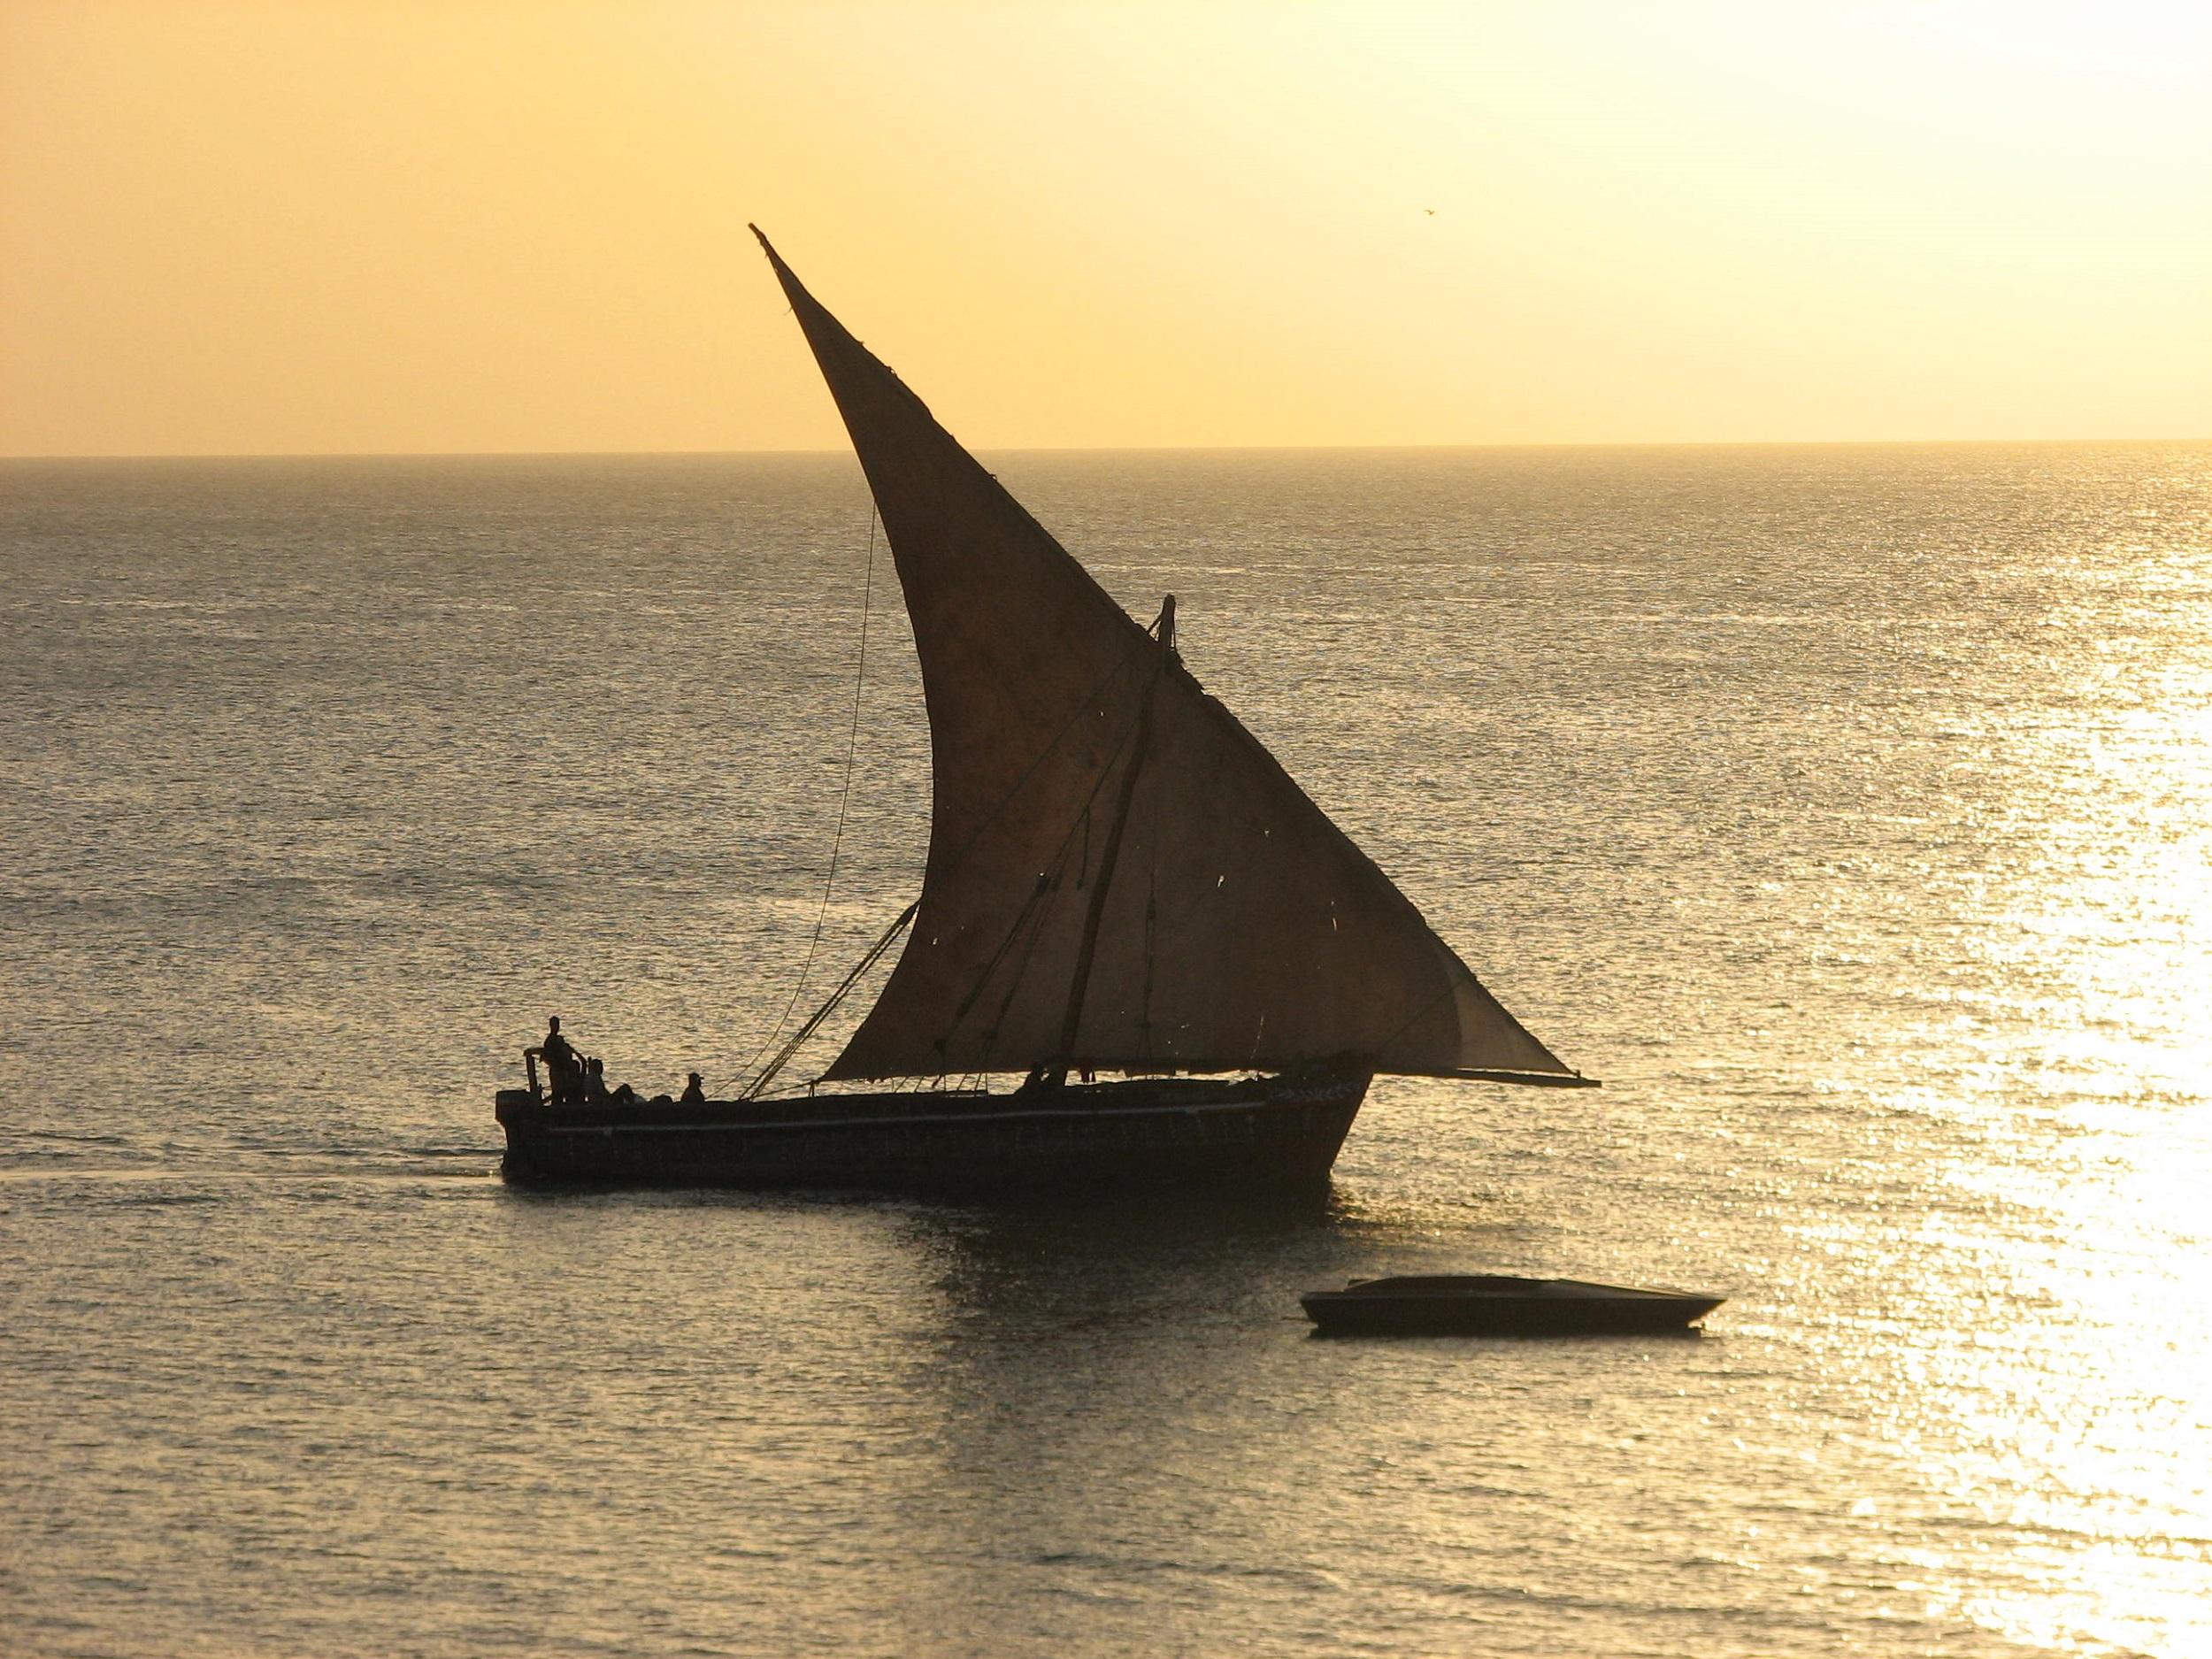 Visit Game Parks in Zanzibar & Tanzania | African Safaris